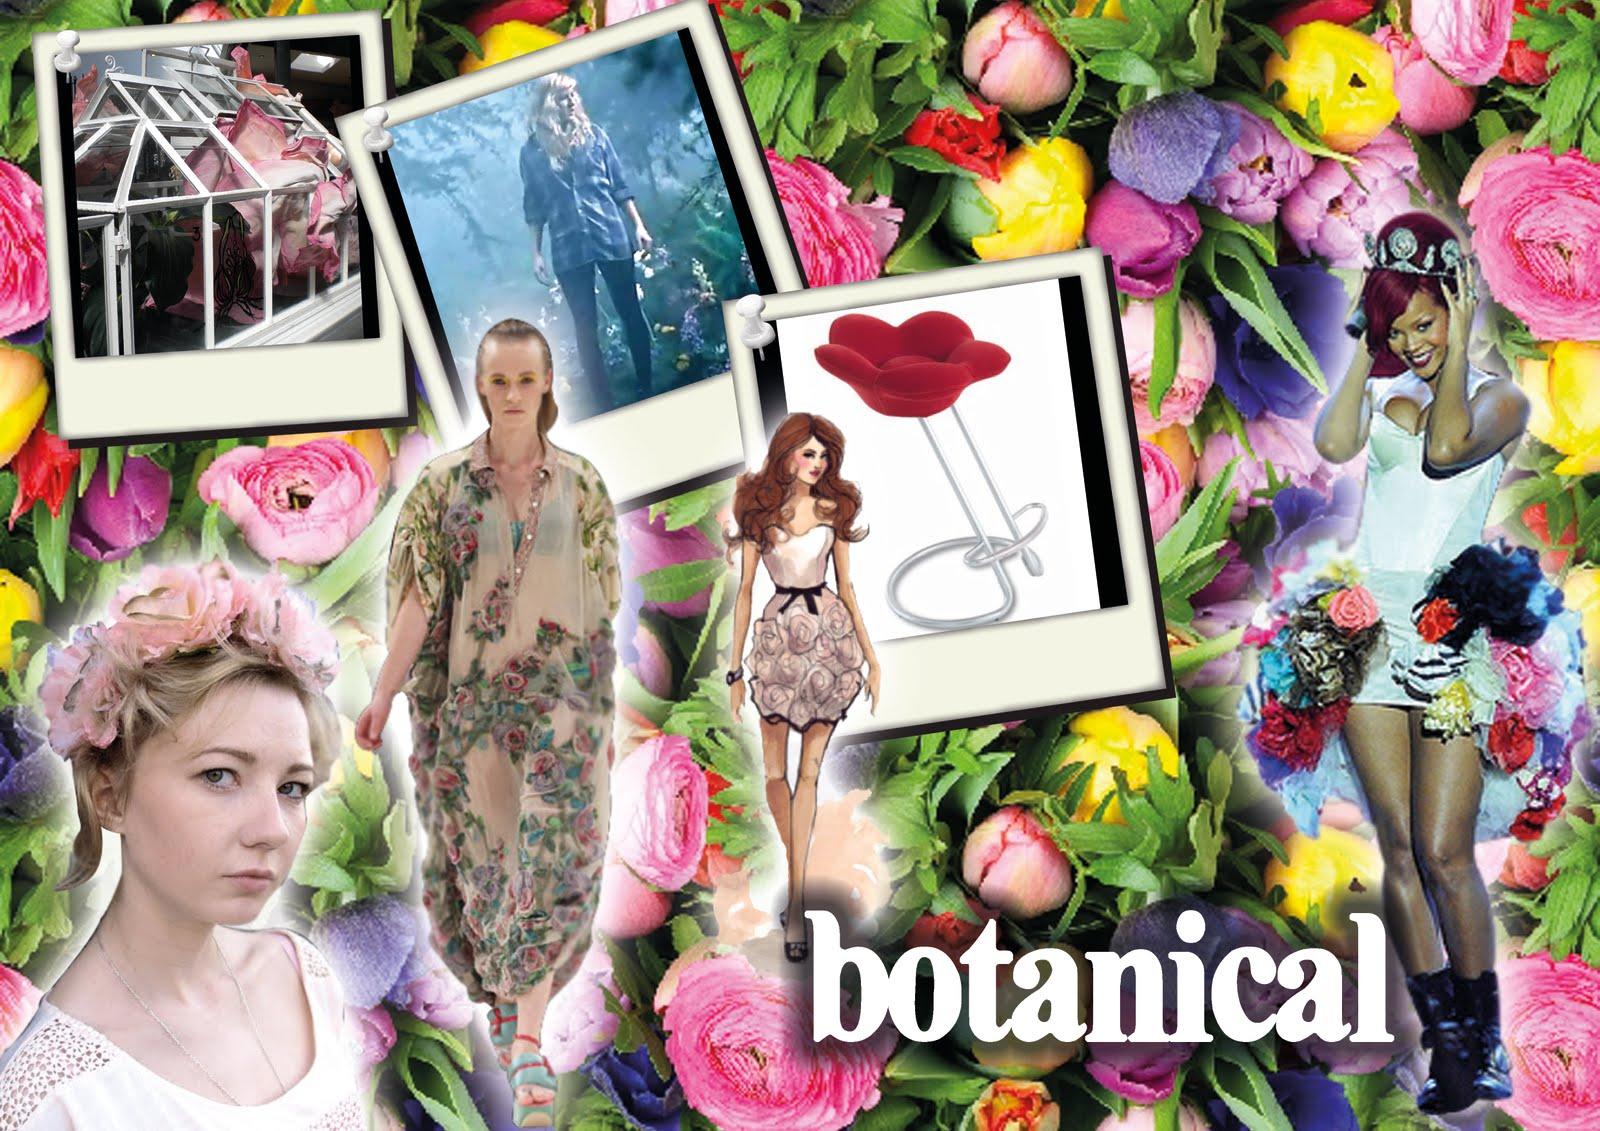 http://4.bp.blogspot.com/-7G6YQ-LtKxI/TeTUTiBJFiI/AAAAAAAAAO0/J23z2c9T7Bo/s1600/botanical.jpg